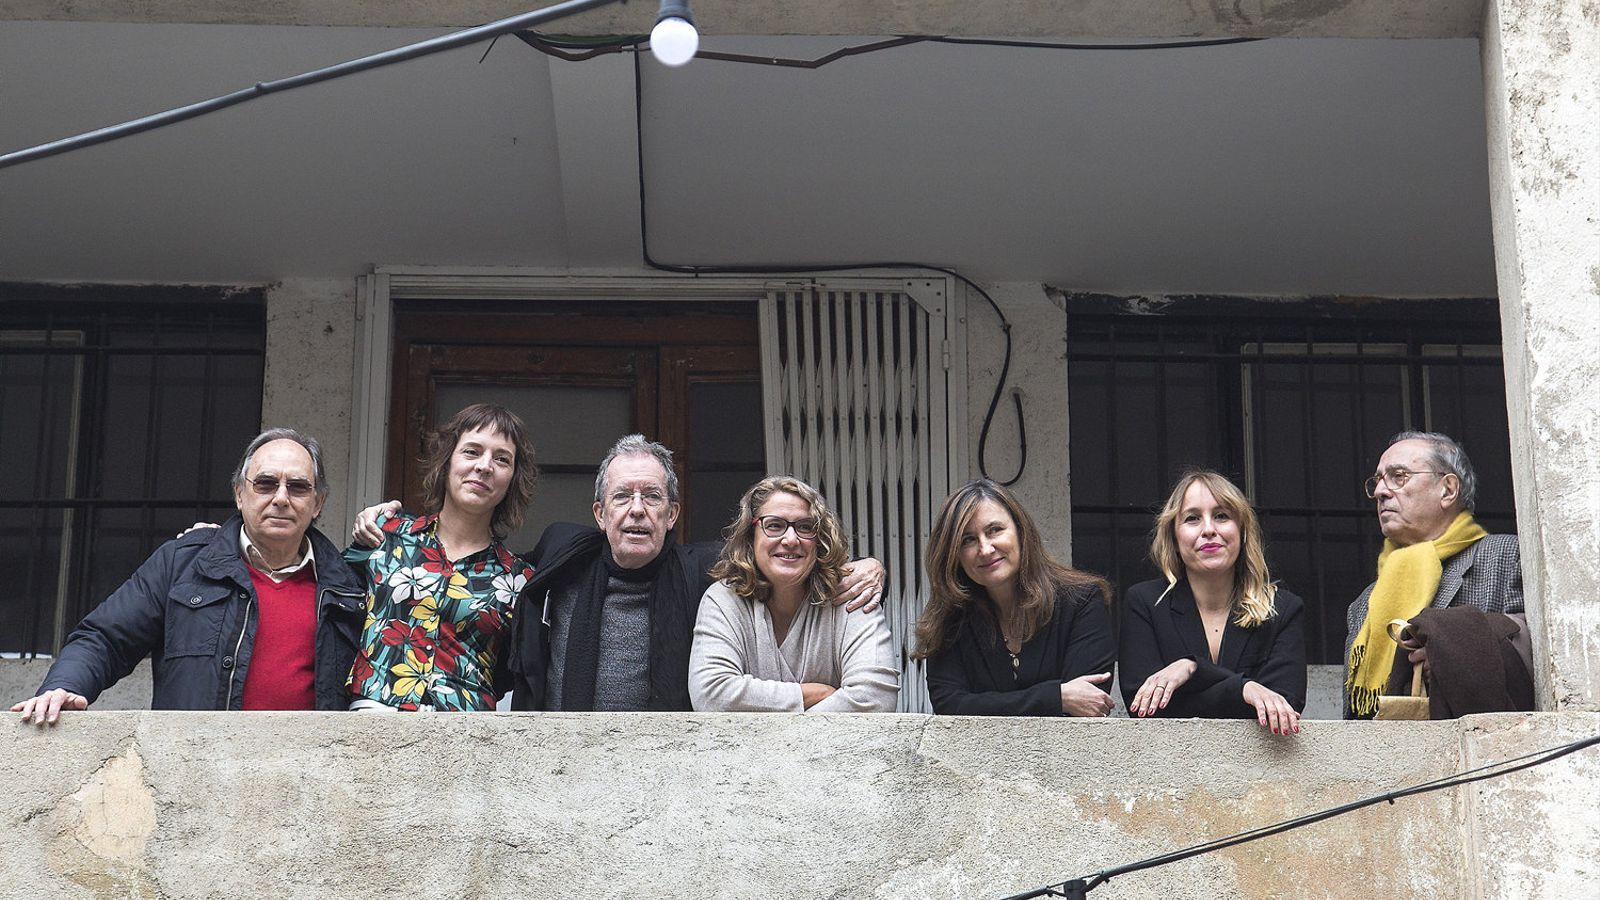 Neix un Frankenstein barceloní i col·lectivitzat